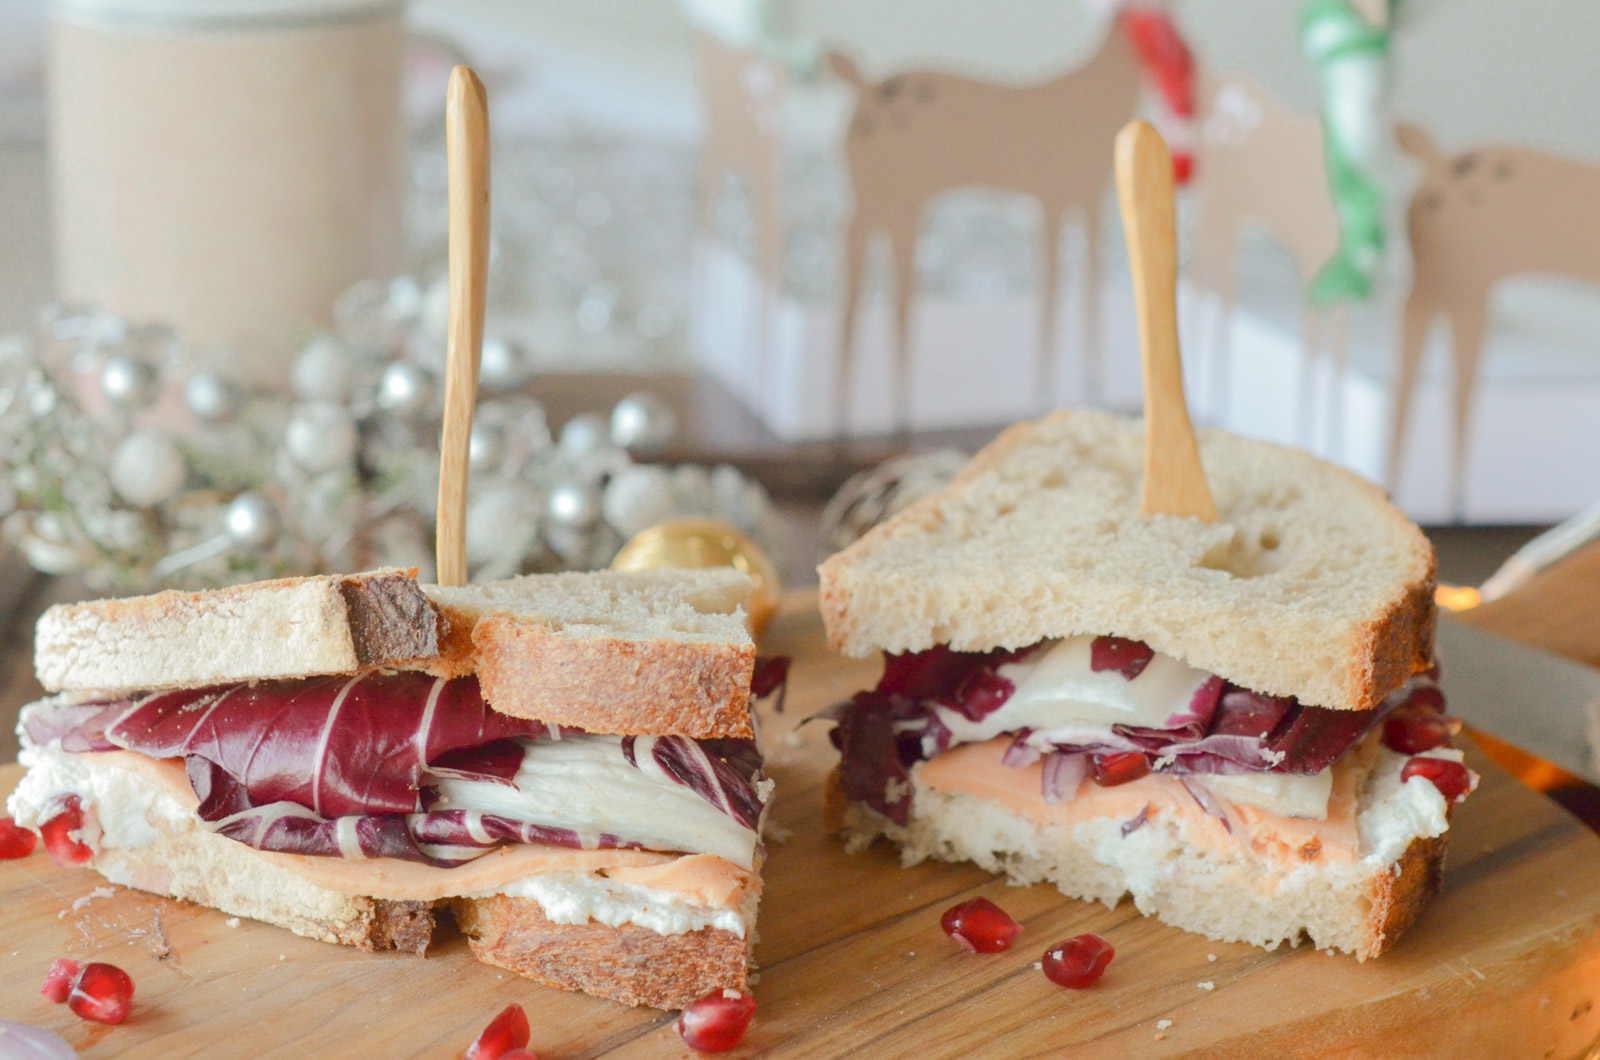 Sandwich Delpierre Saumon Grenade 4 Sur 5